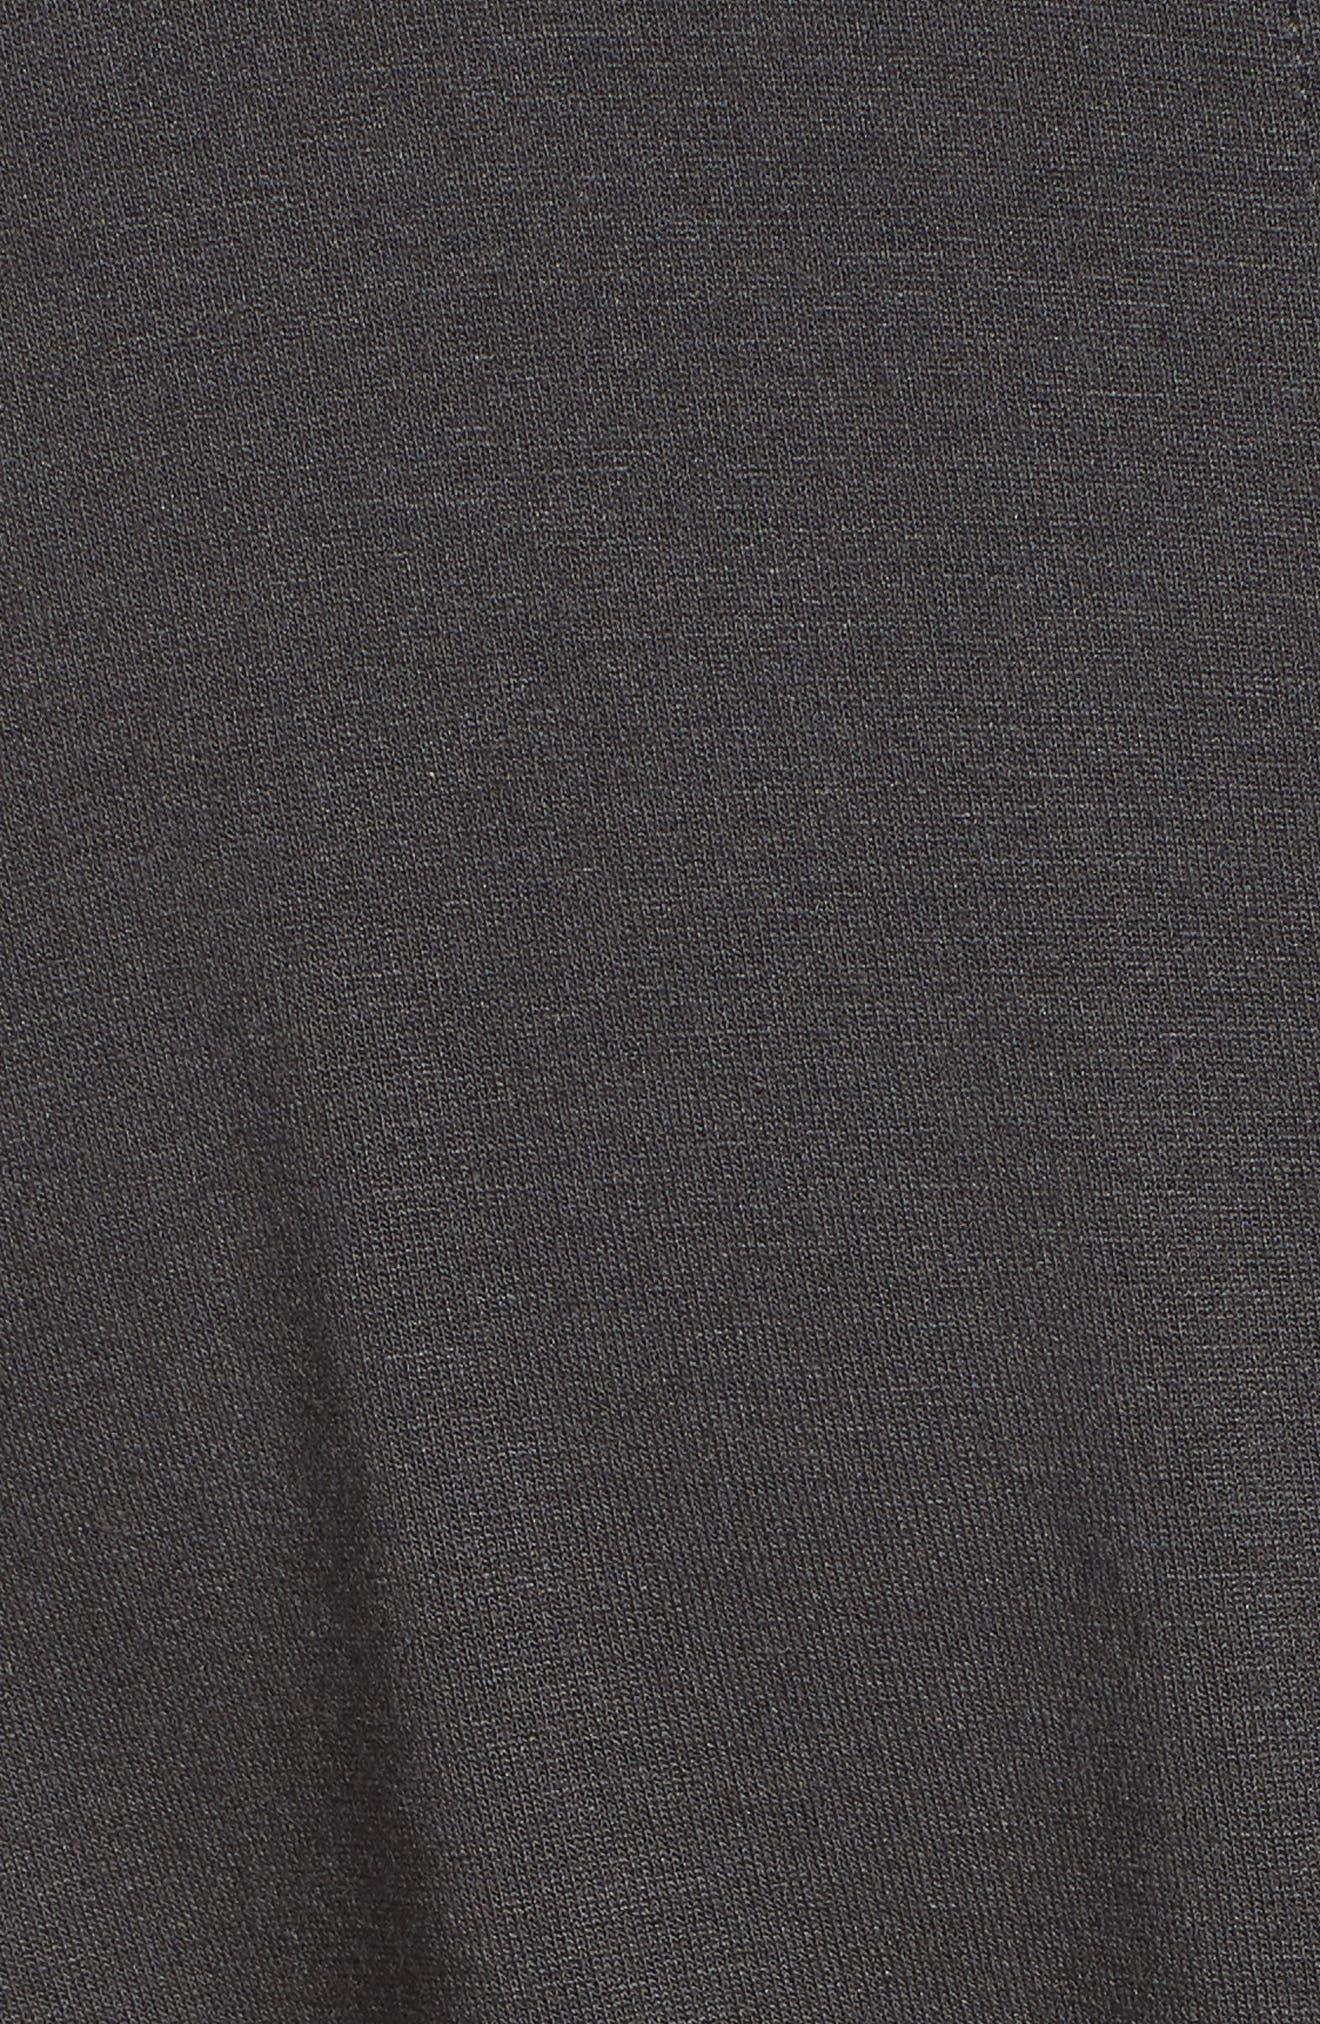 Alternate Image 5  - Eileen Fisher Tie Back Dress (Regular & Petite)